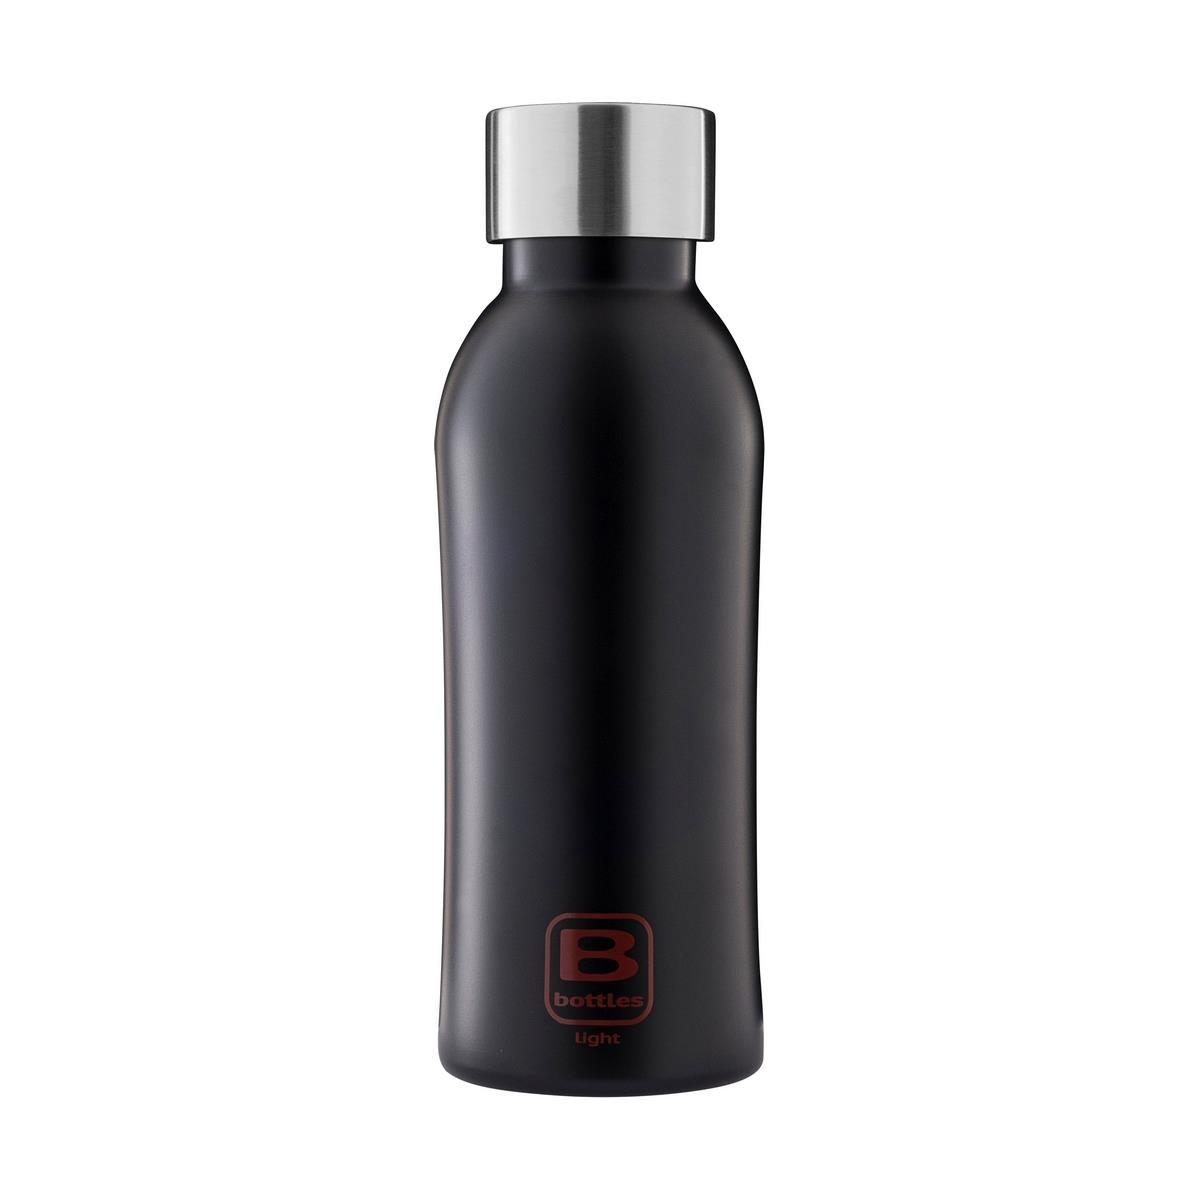 B Bottles Light - Nero Opaco - 530 ml - Bottiglia in acciaio inox 18/10 ultra leggera e compatta